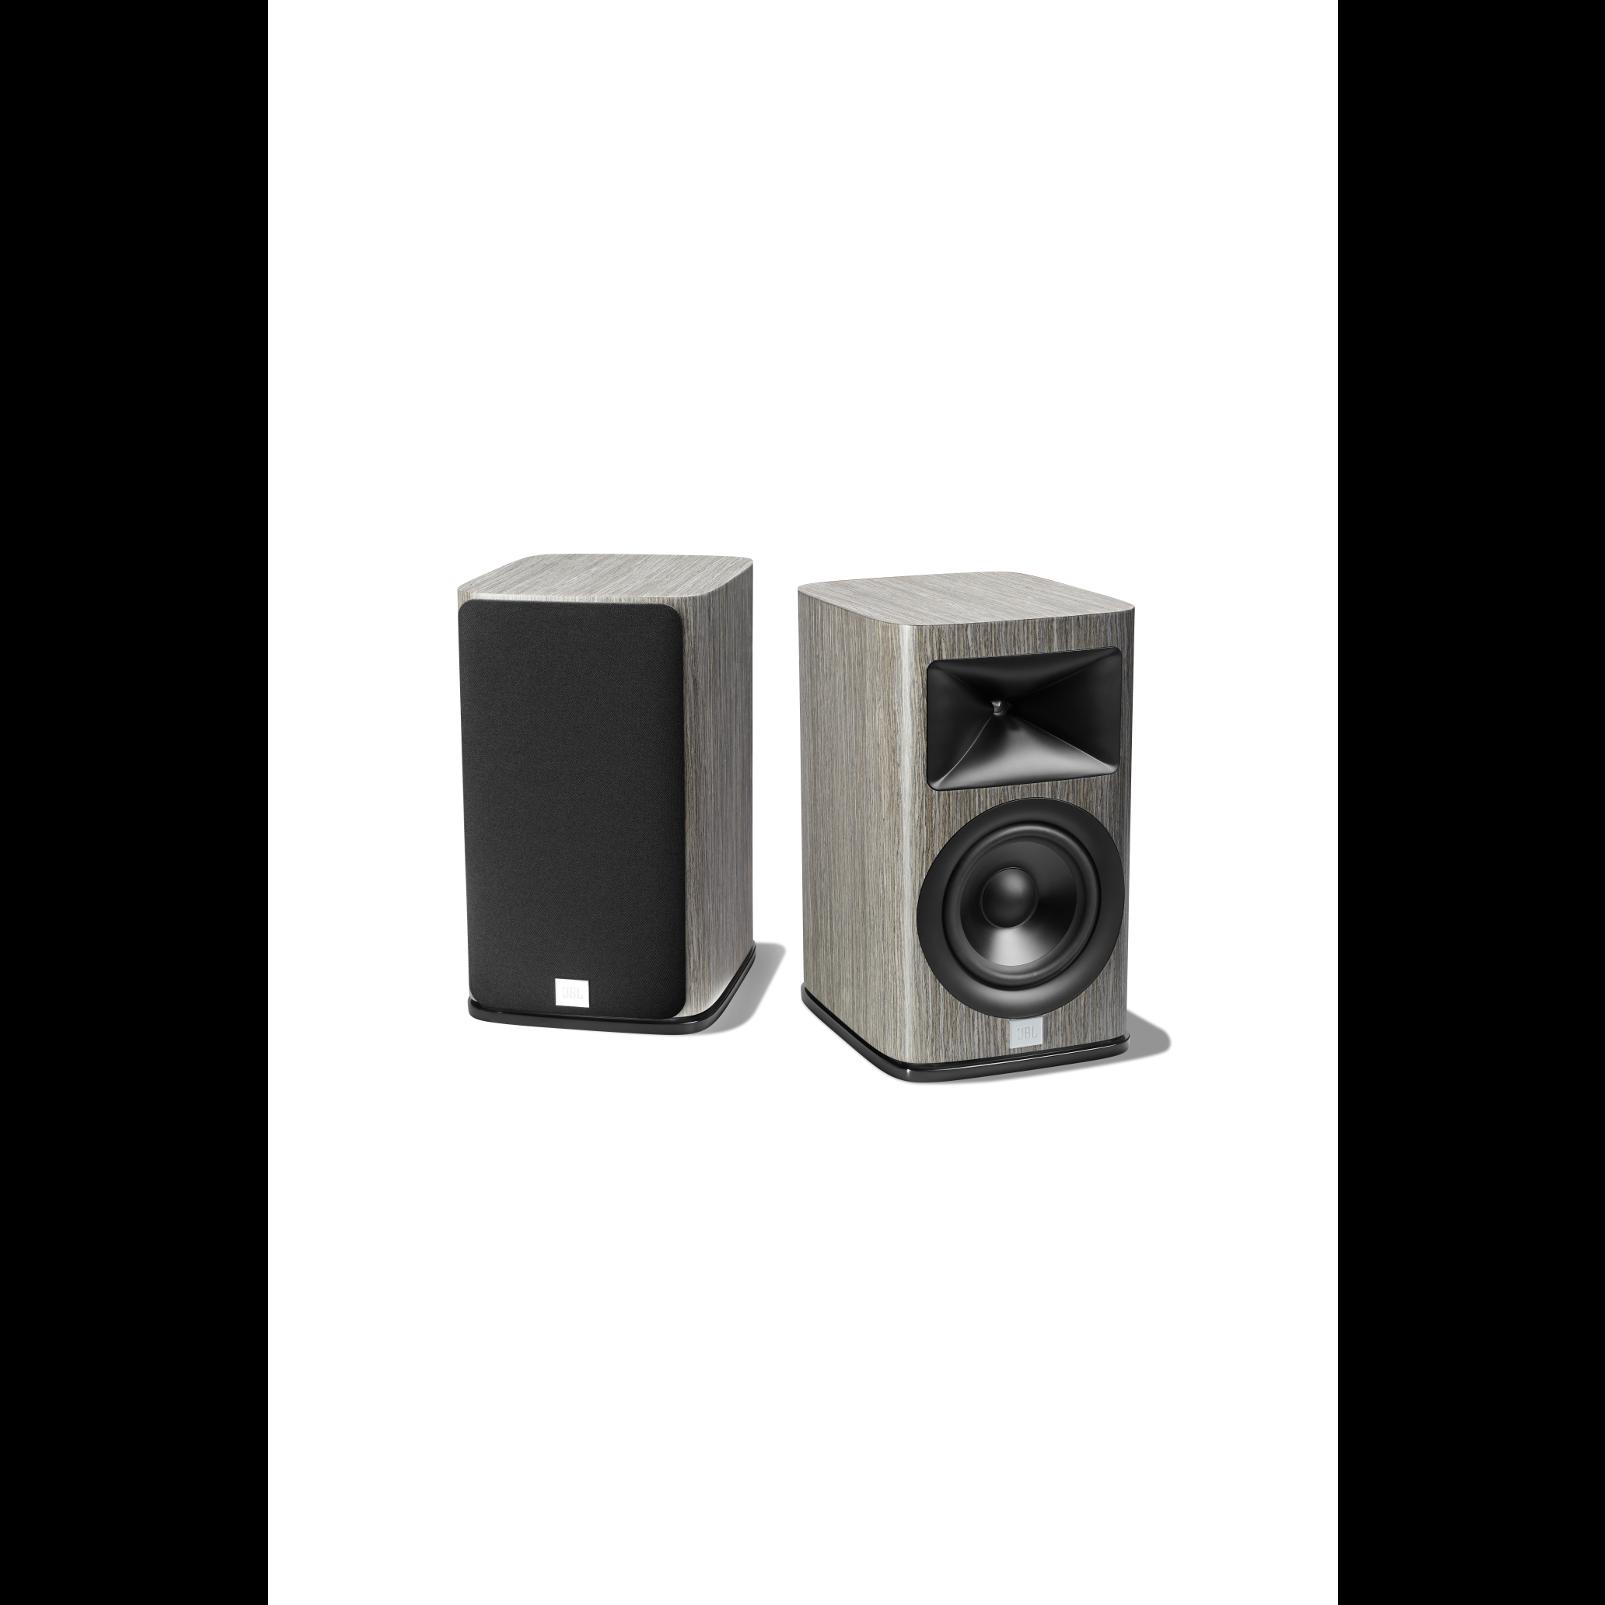 HDI-1600 - Grey Oak - 2-way 6.5-inch (165mm) Bookshelf Loudspeaker - Detailshot 3